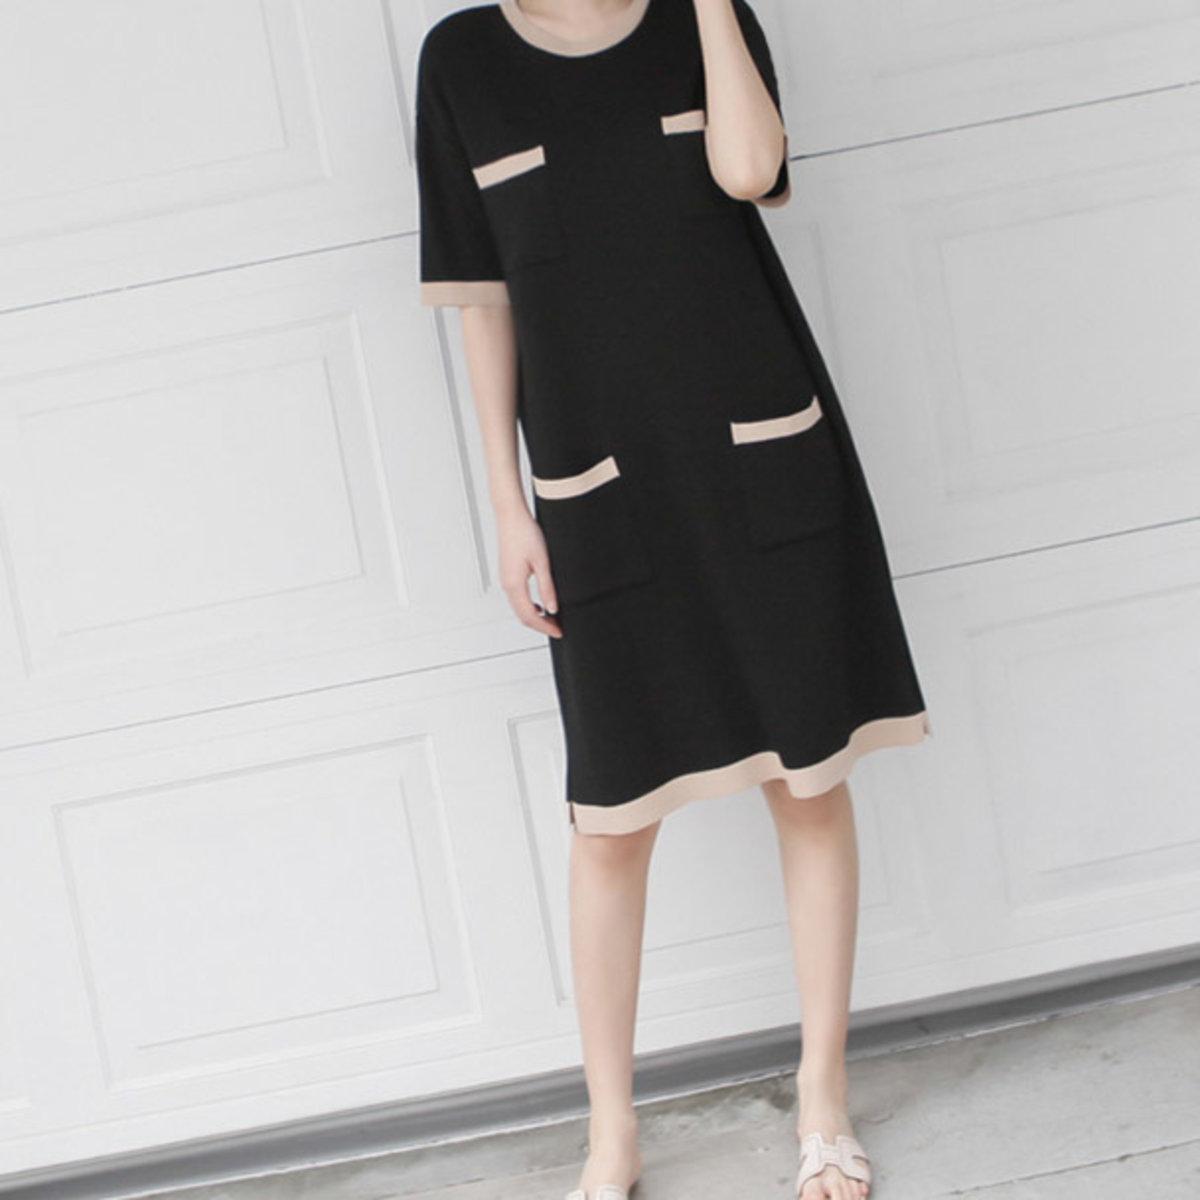 Pocket Colored Knit Dress